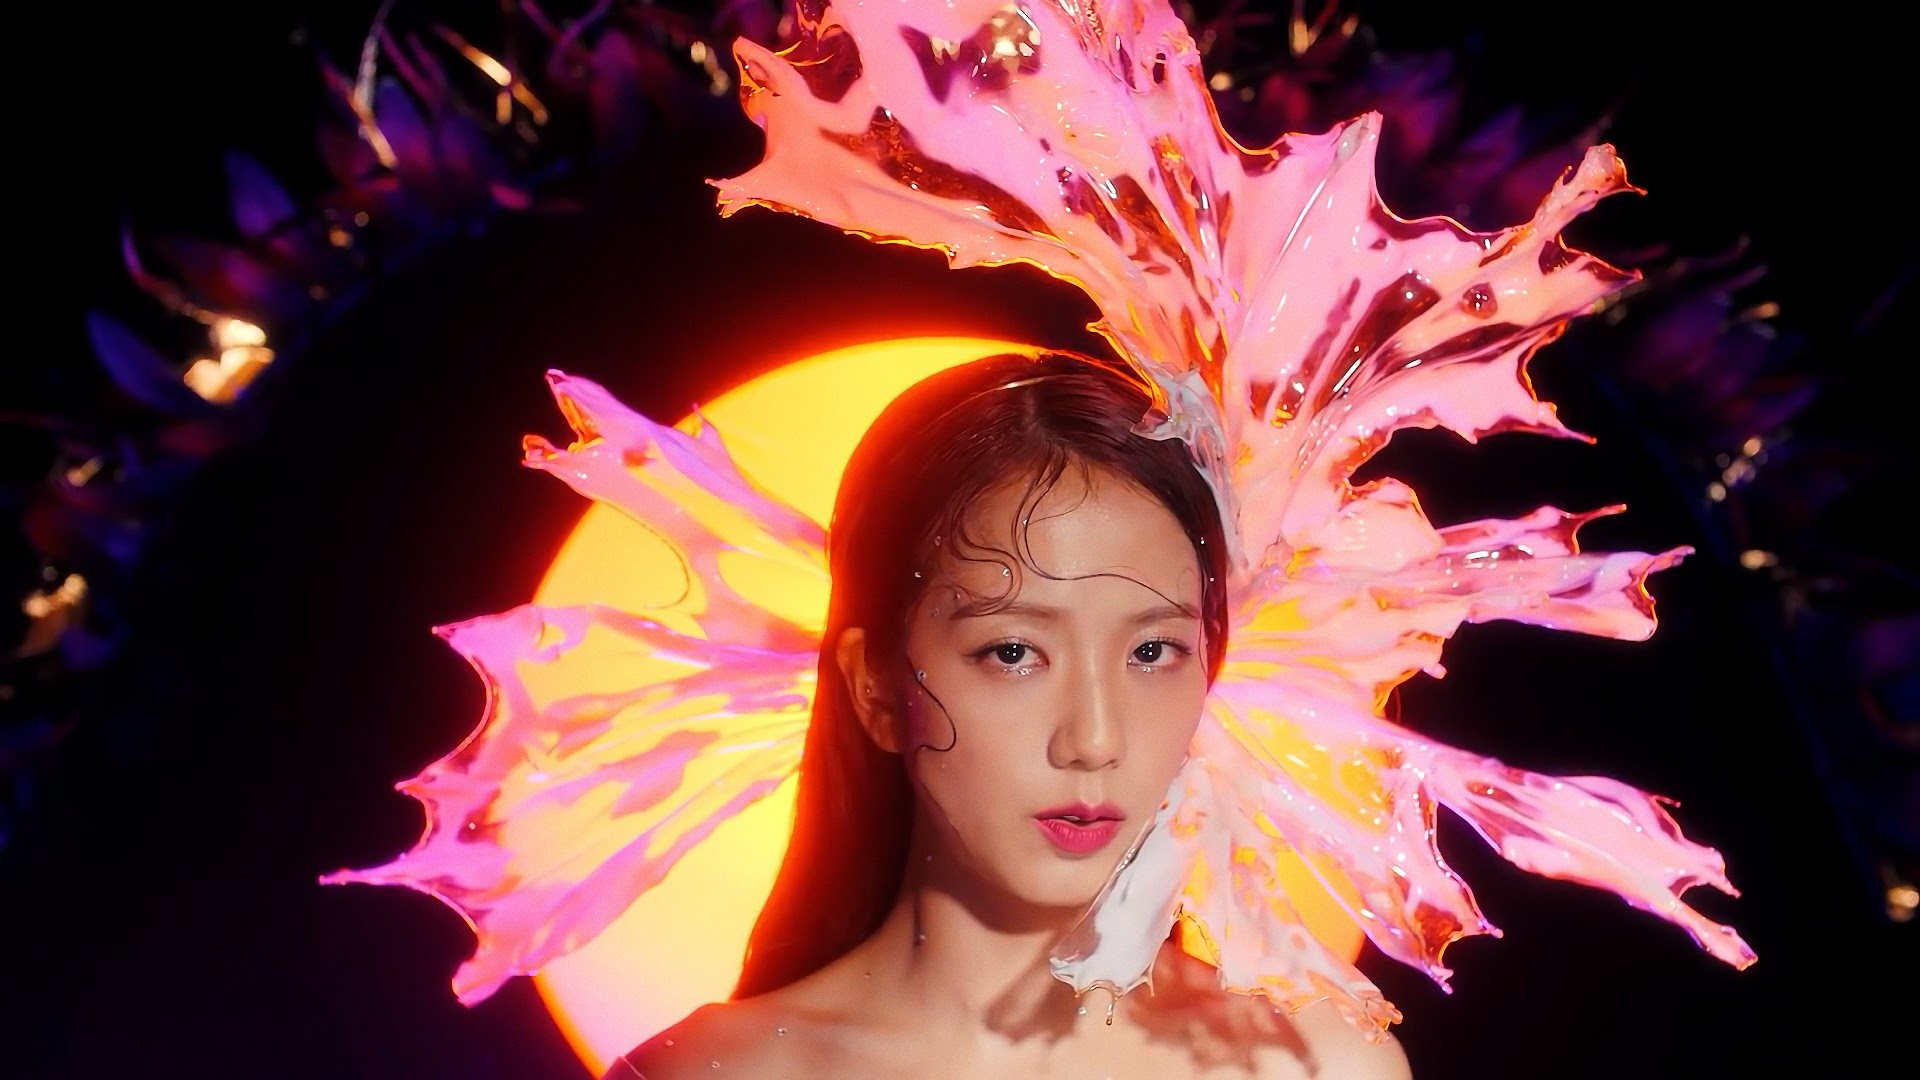 blackpink kill this love jisoo uhdpaper.com 4K 13